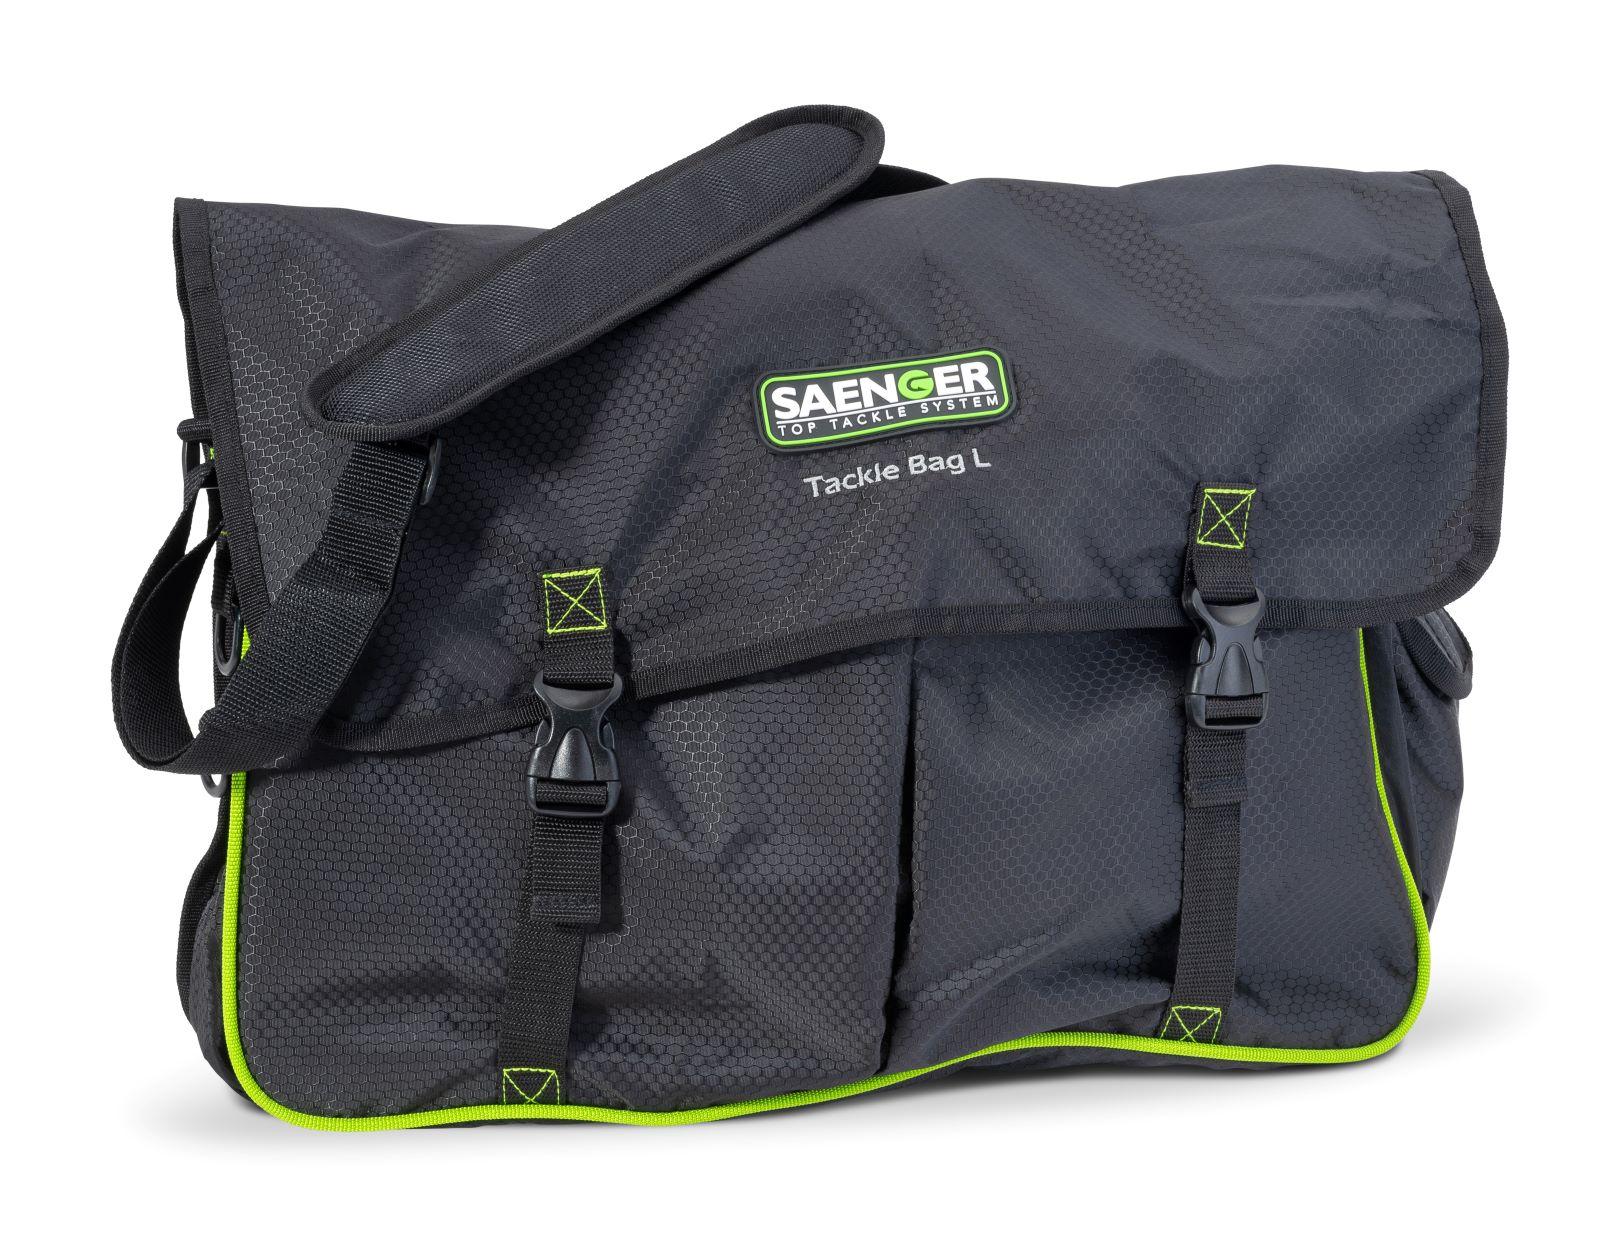 Saenger taška přes rameno Allround Tackle Bag L